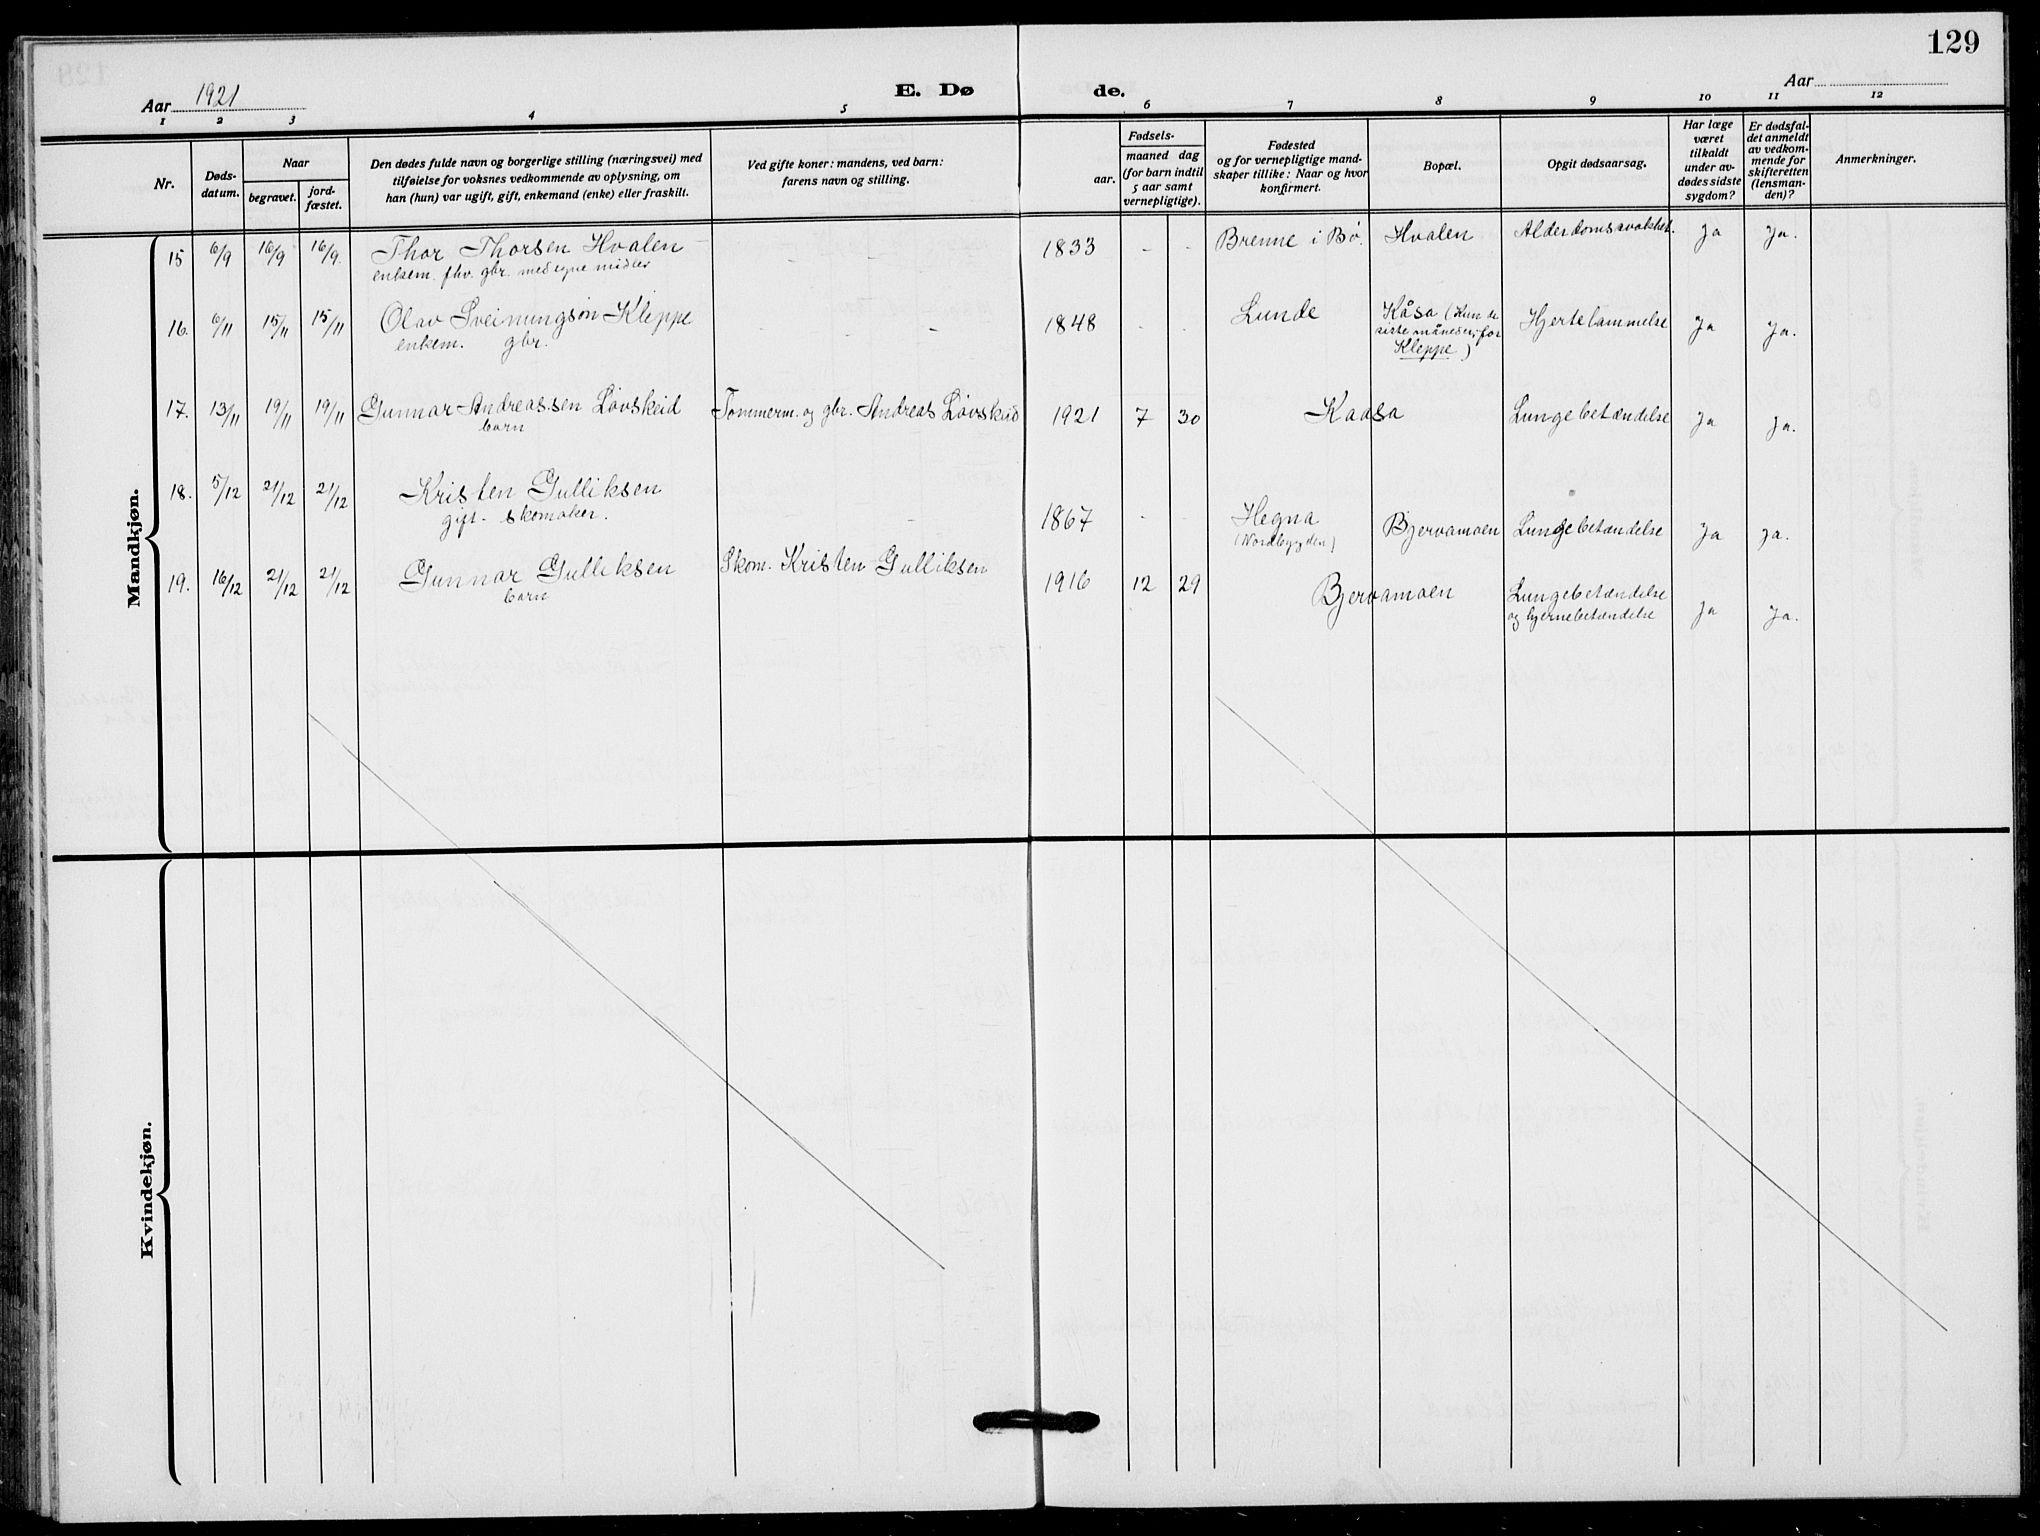 SAKO, Lunde kirkebøker, F/Fa/L0005: Parish register (official) no. I 5, 1914-1922, p. 129